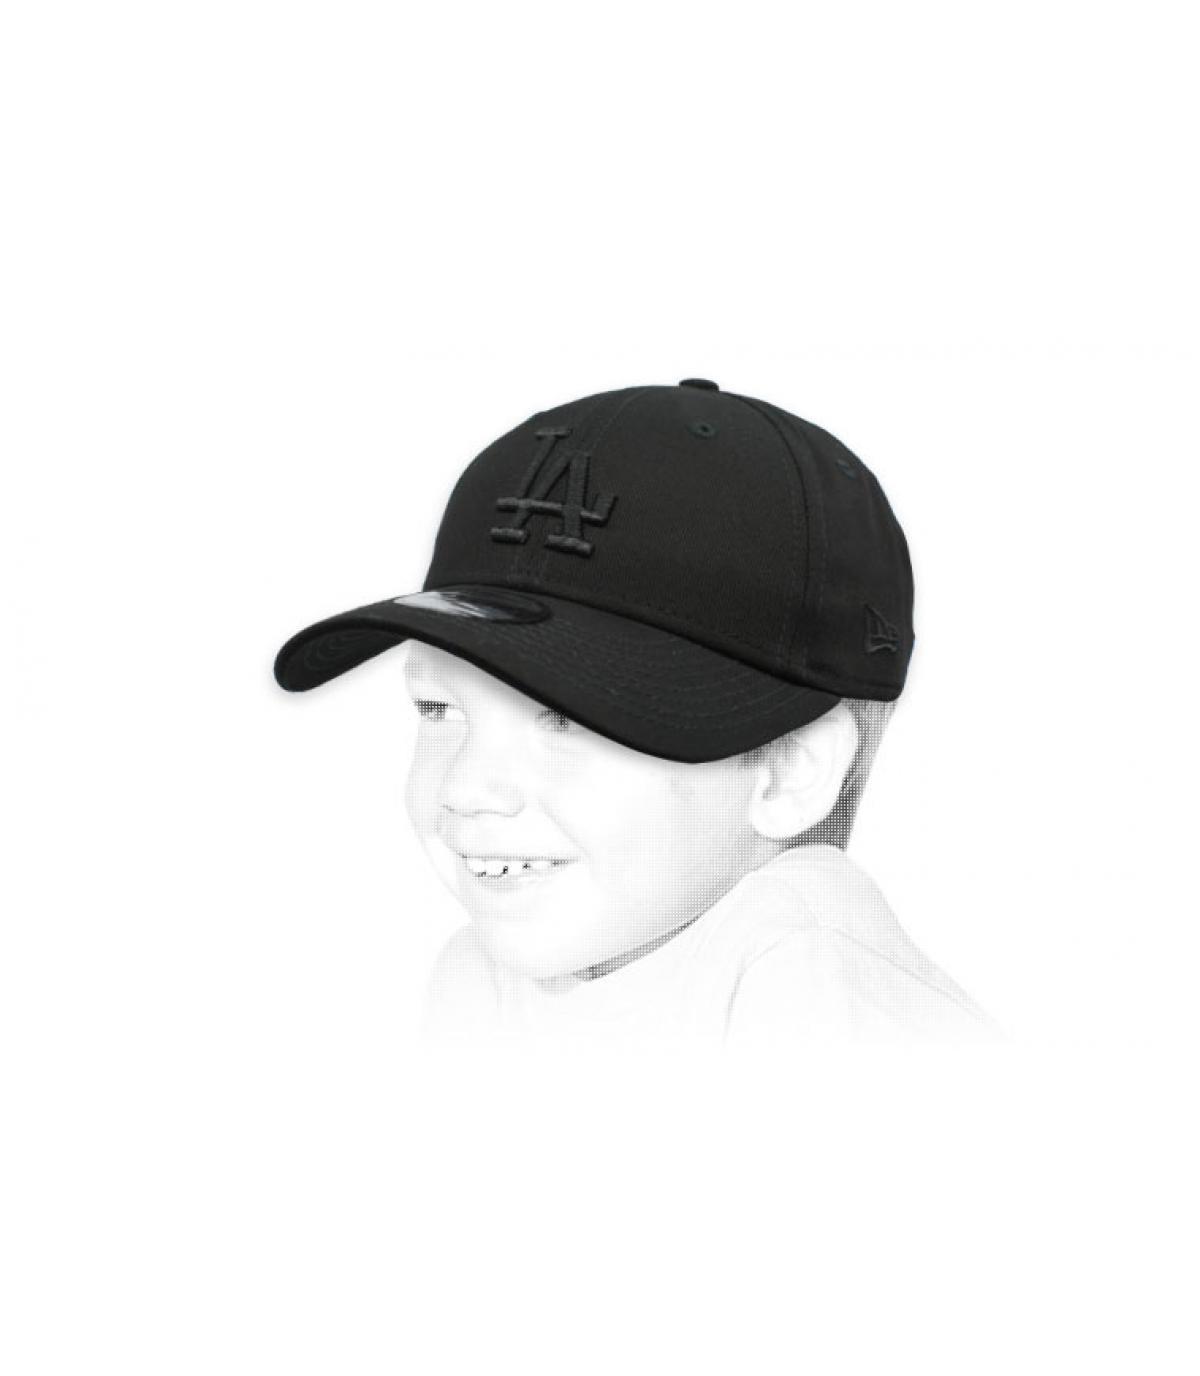 gorra infantil LA negro